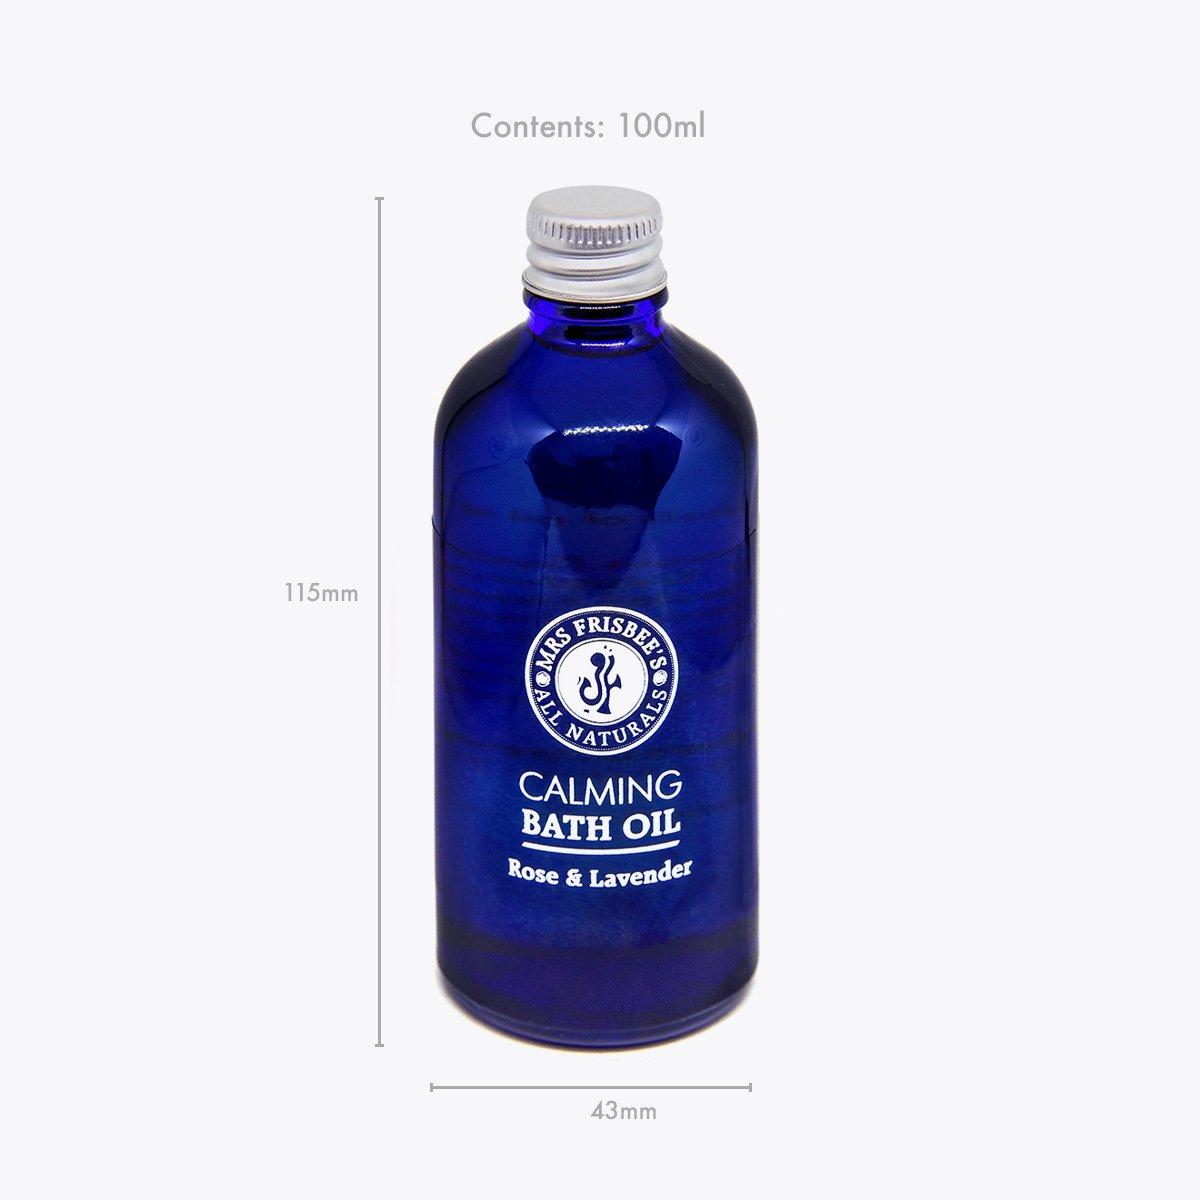 Calming Bath Oil product measurements